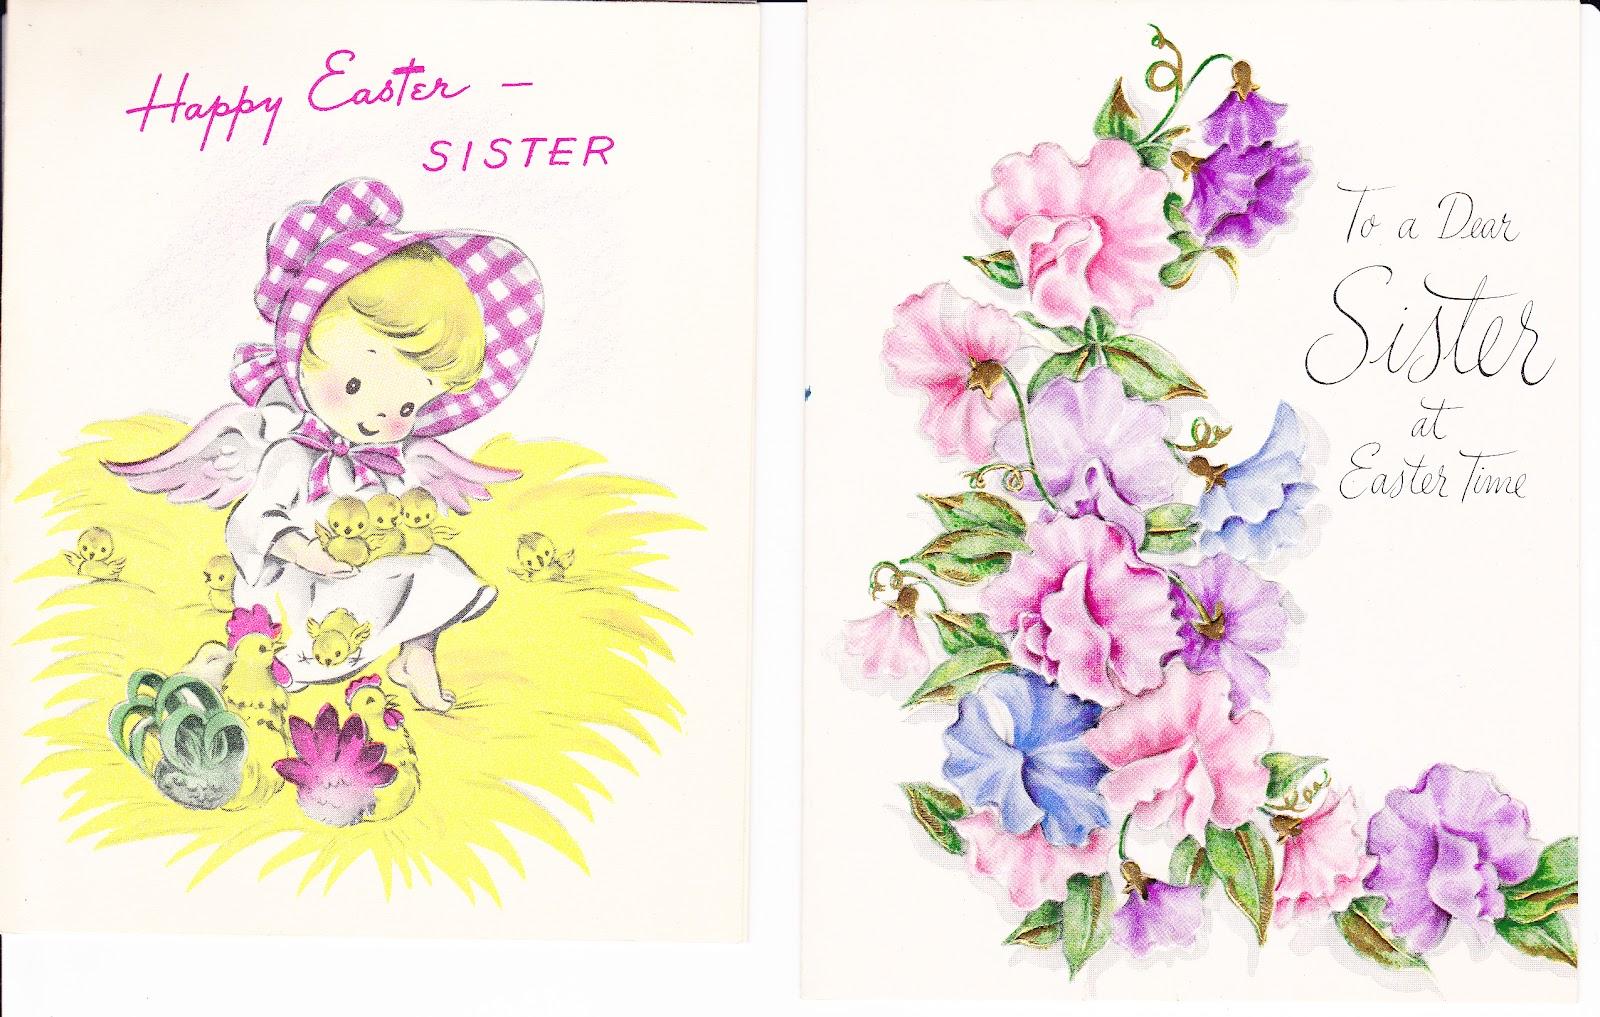 Madeline S Memories Vintage Christmas Cards: Madeline's Memories: Vintage Easter Greeting Cards